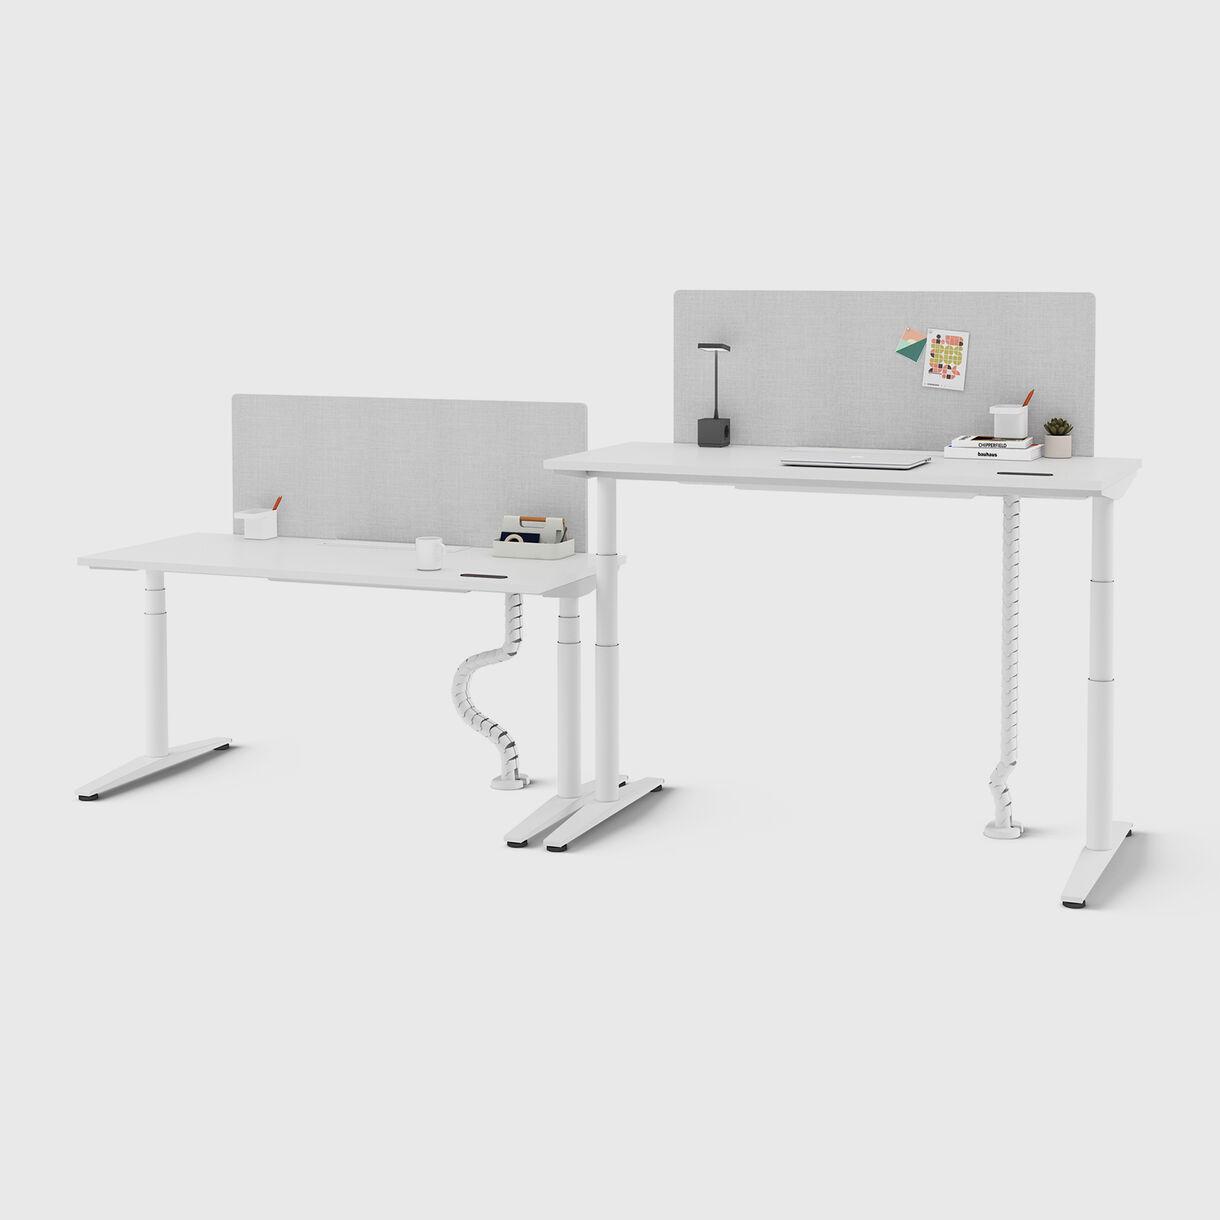 Ratio Workstation, Round Leg